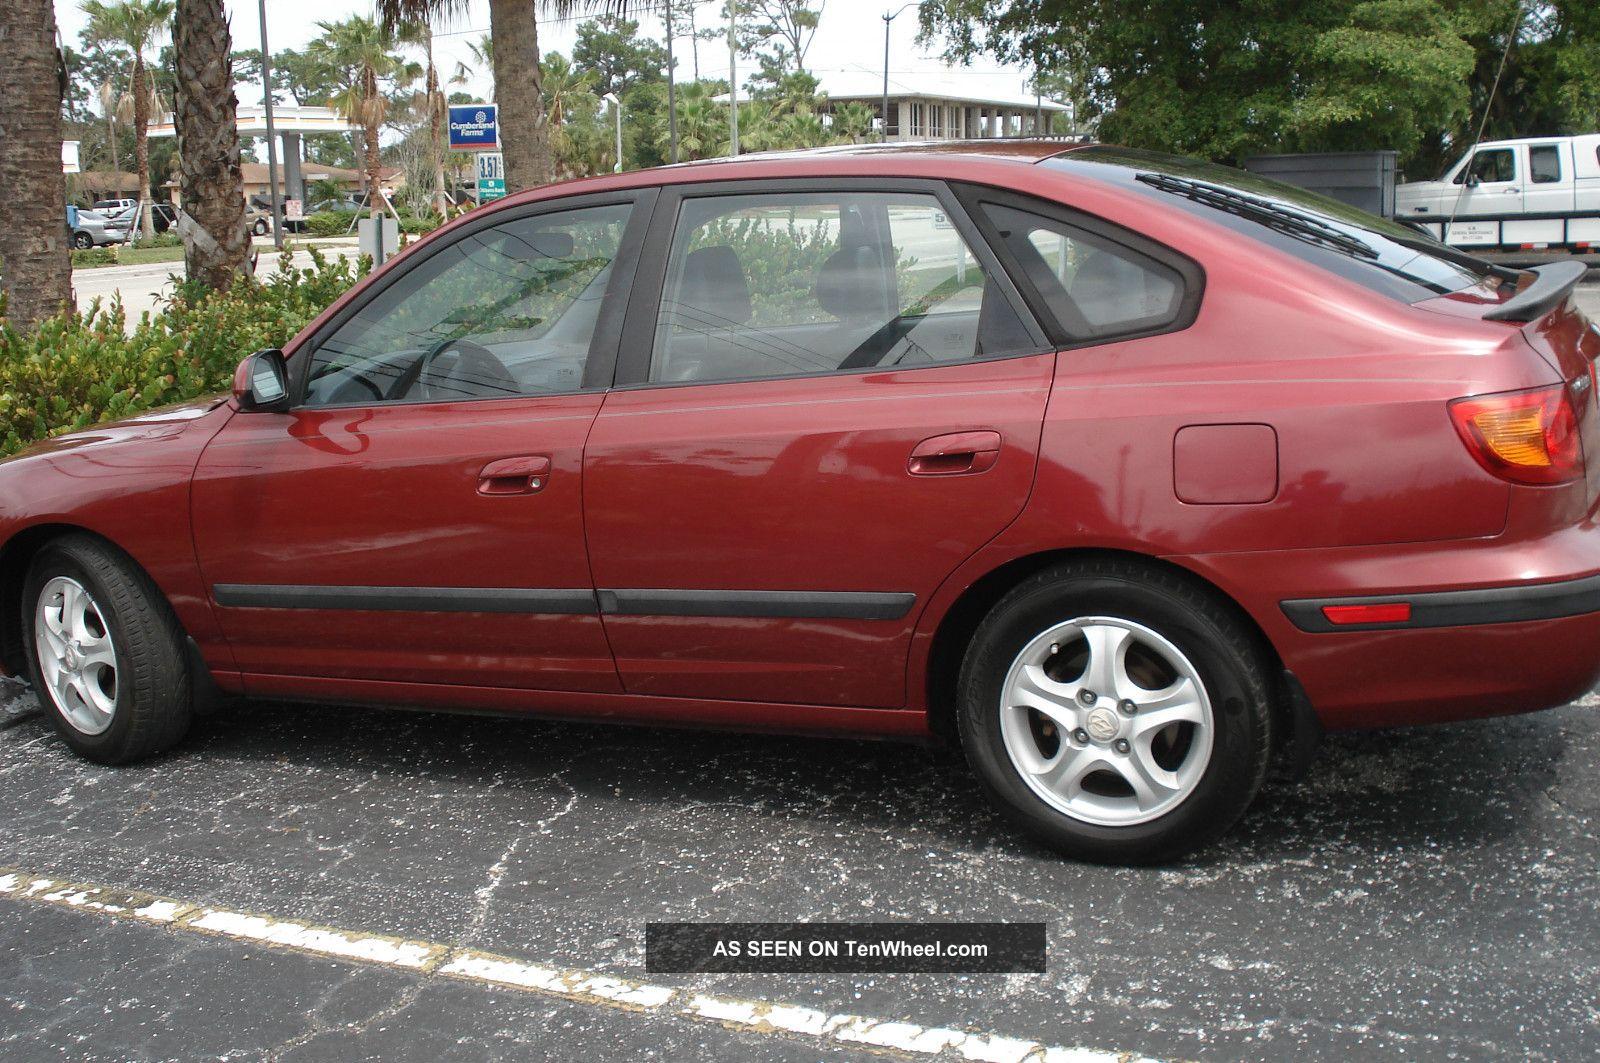 2002 Hyundai Elantra Gt Hatchback 5 Door 2 0l Interior